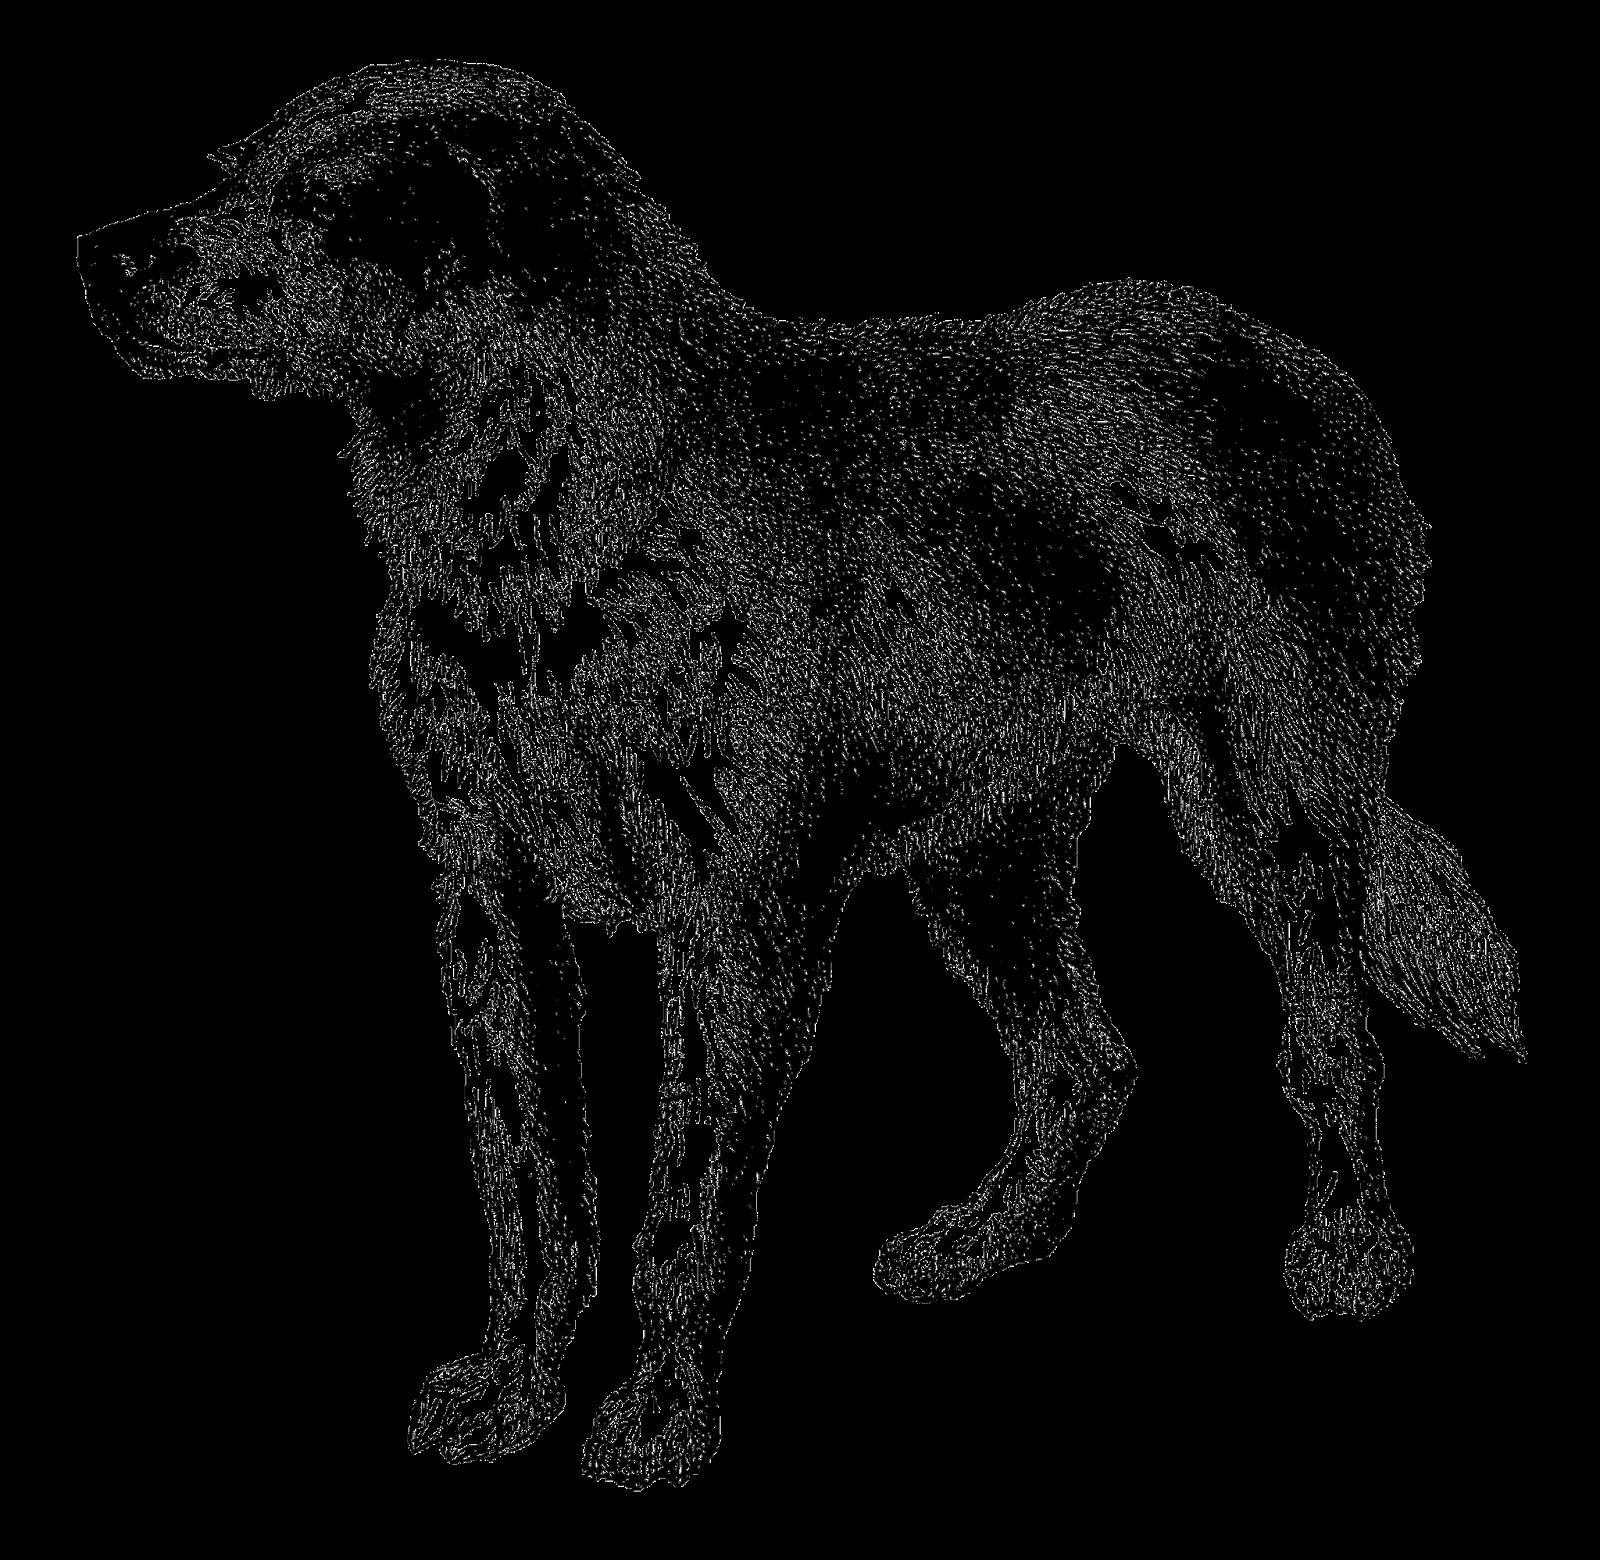 Dog breeds clipart graphic Antique Images: Vintage Dog Breed Boarhound Digital Download Animal ... graphic